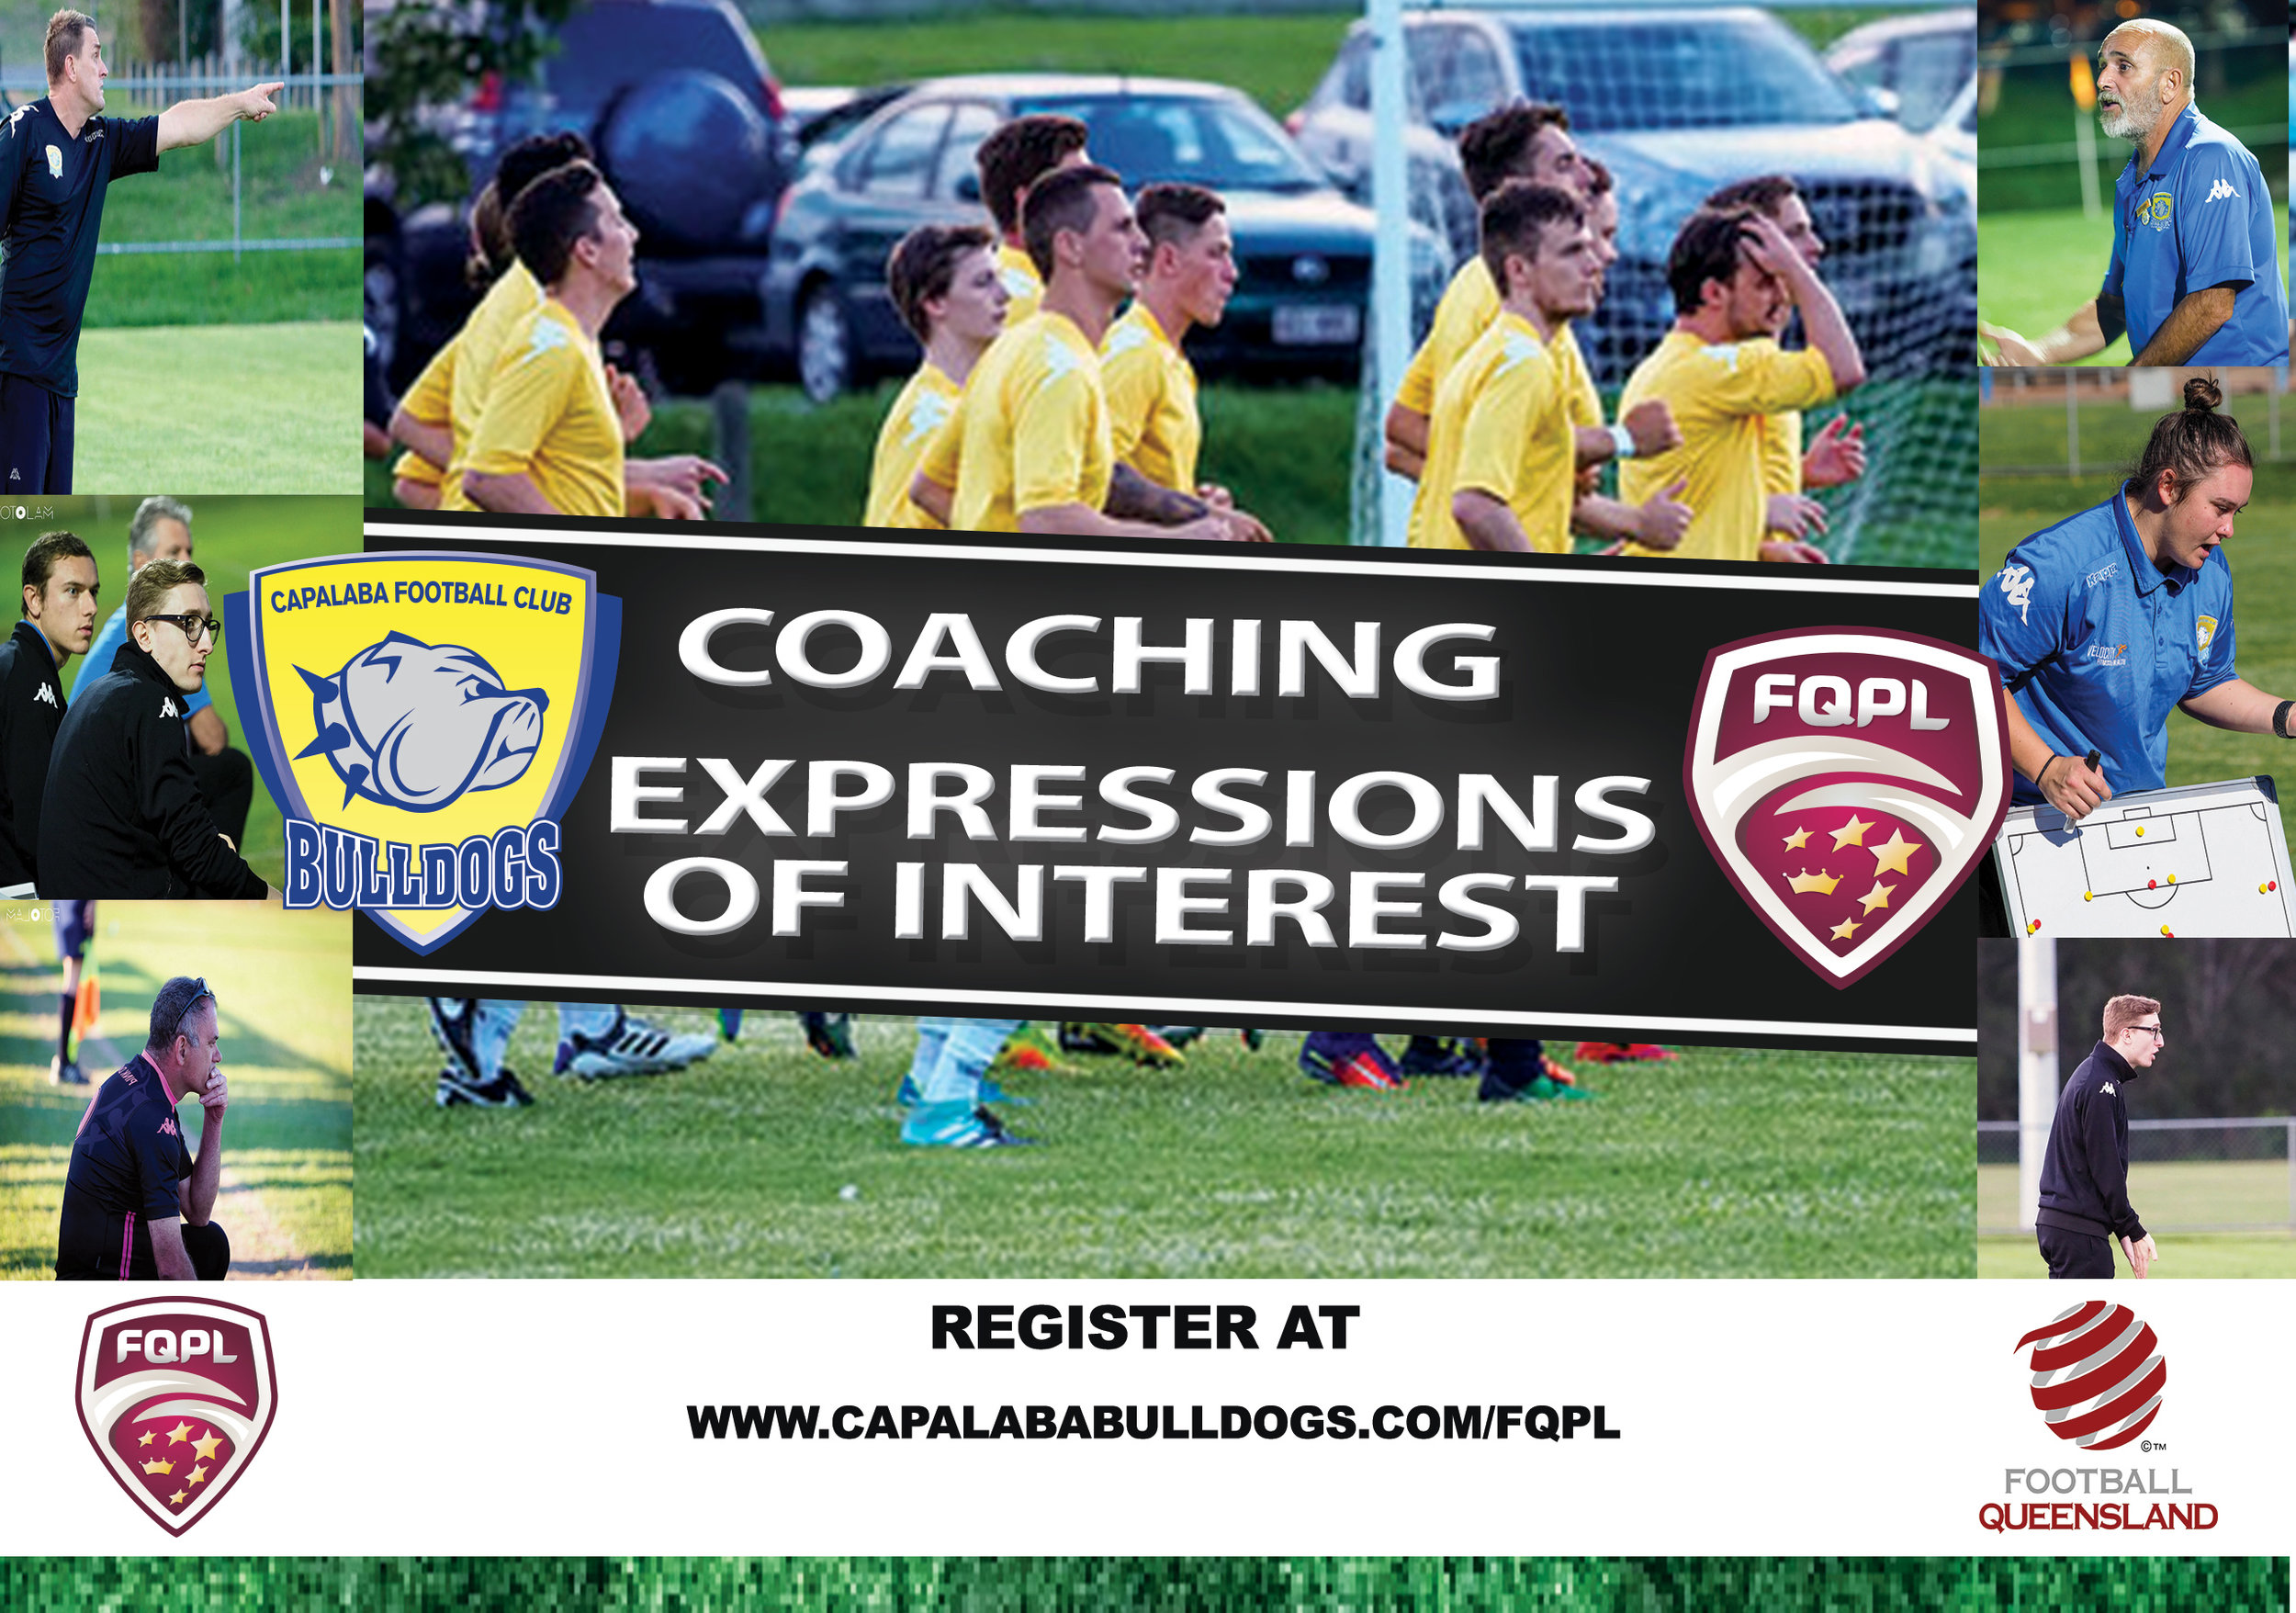 FQPL Coaching EOI NEW.jpg